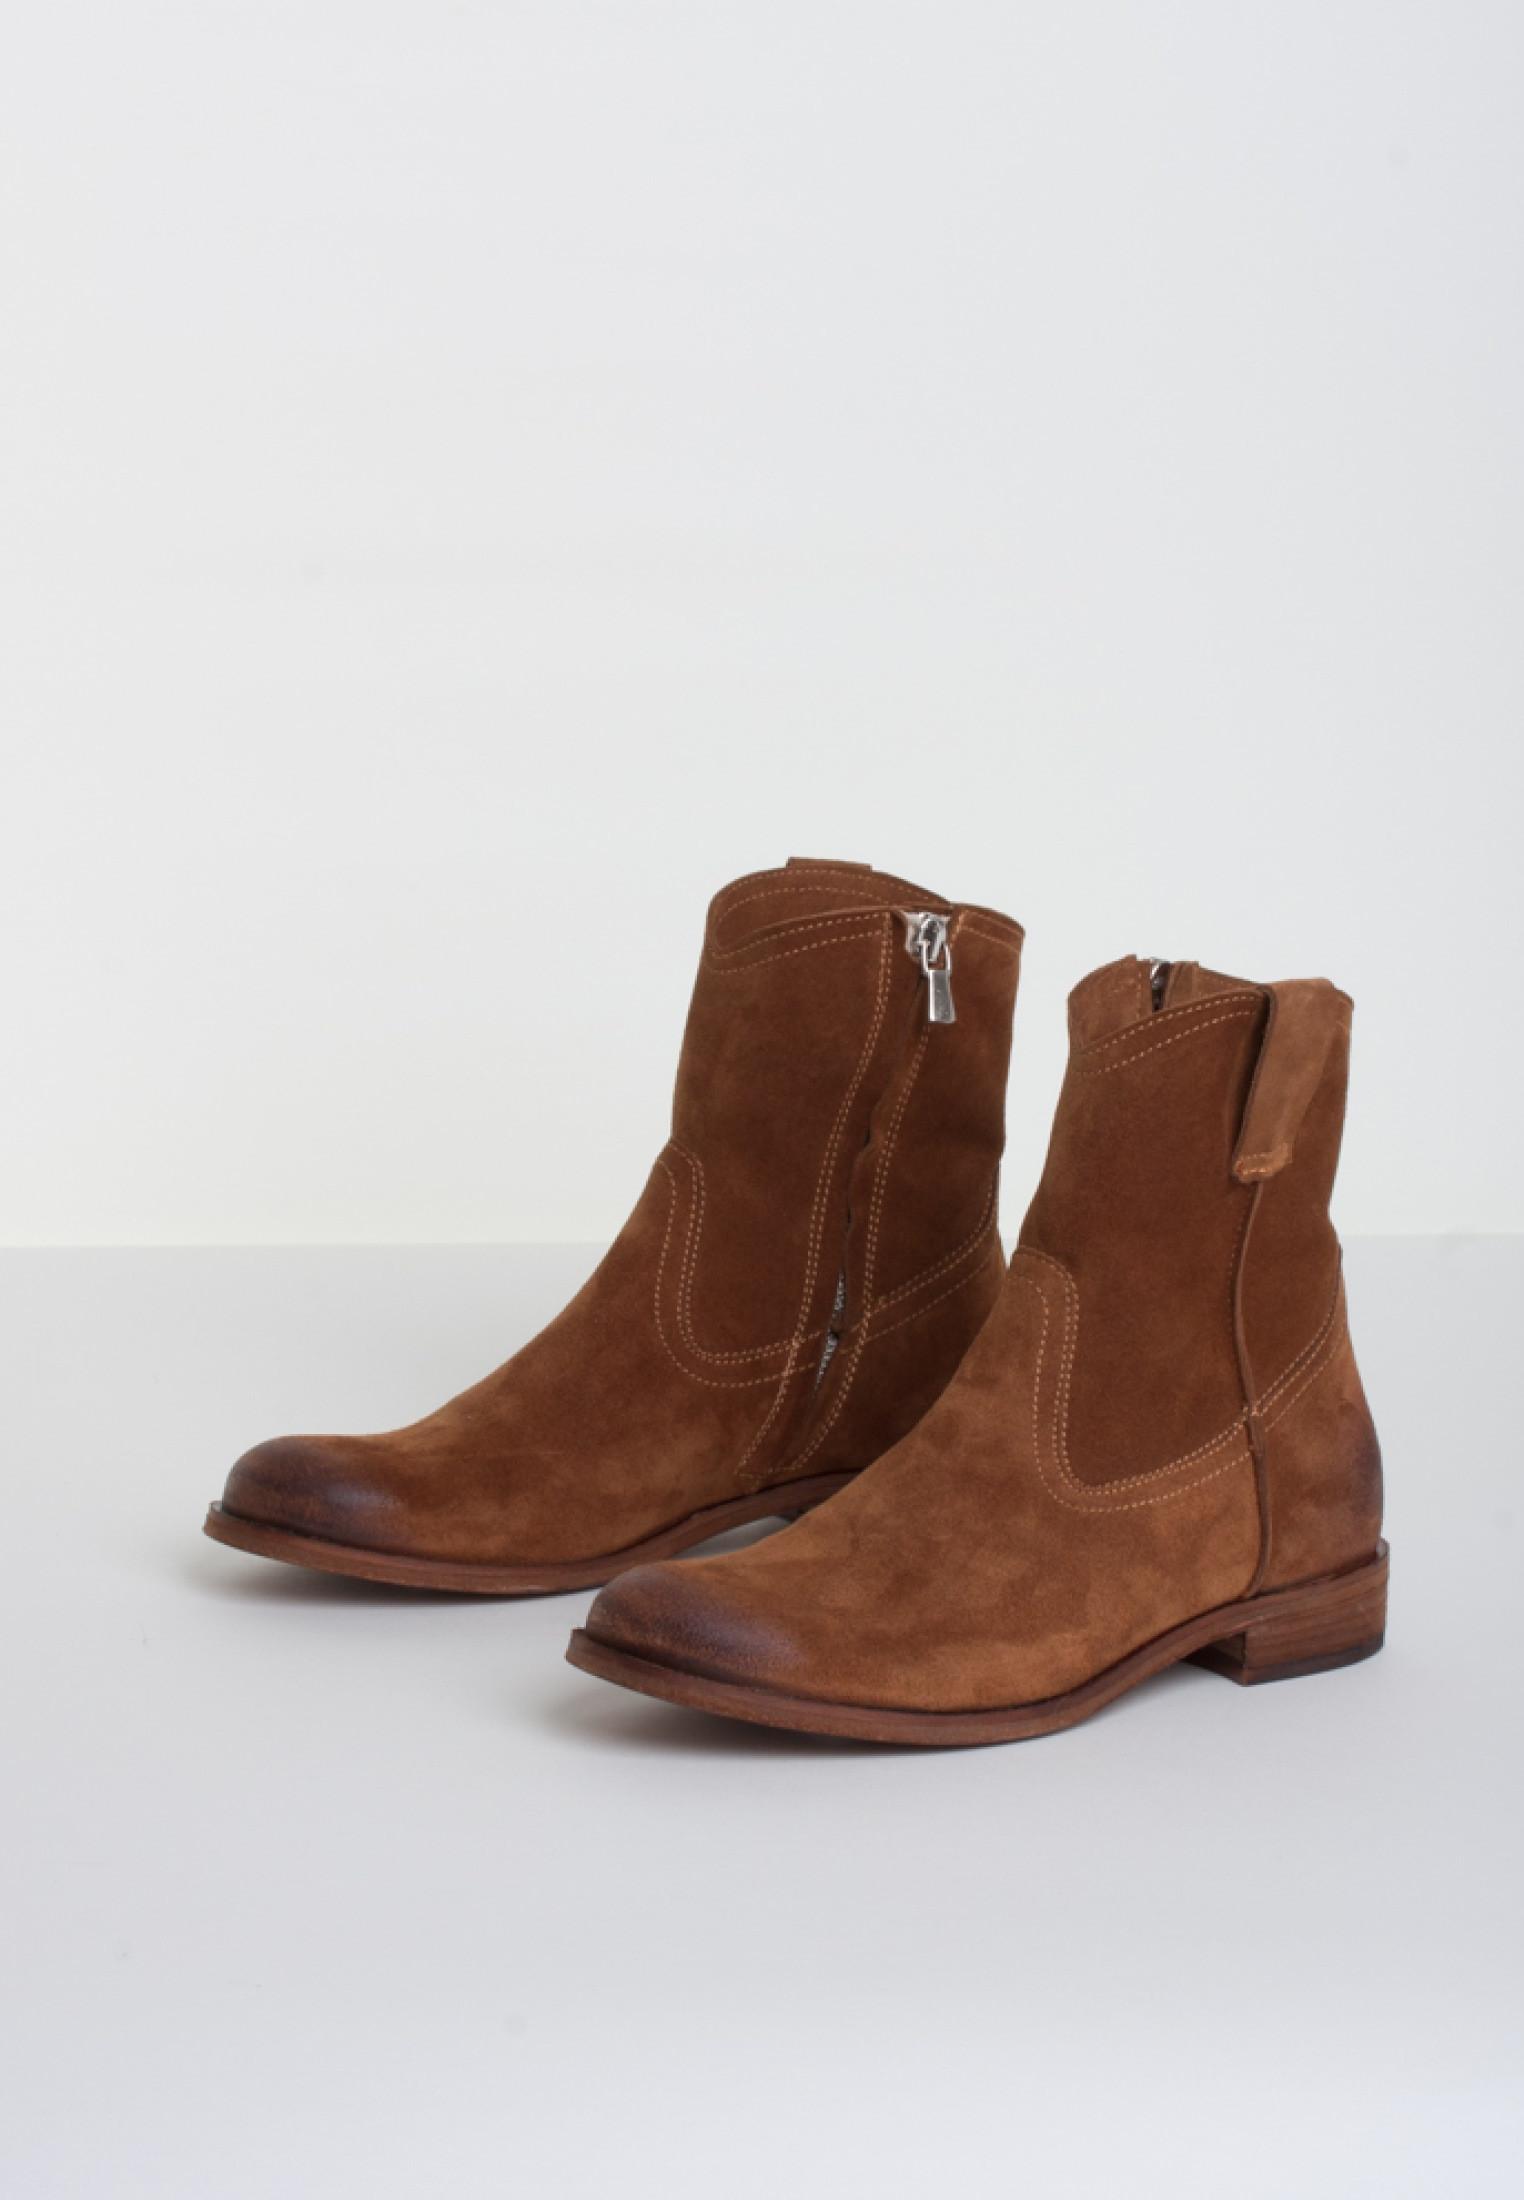 Bukela ruskindsstøvle på lav hæl.